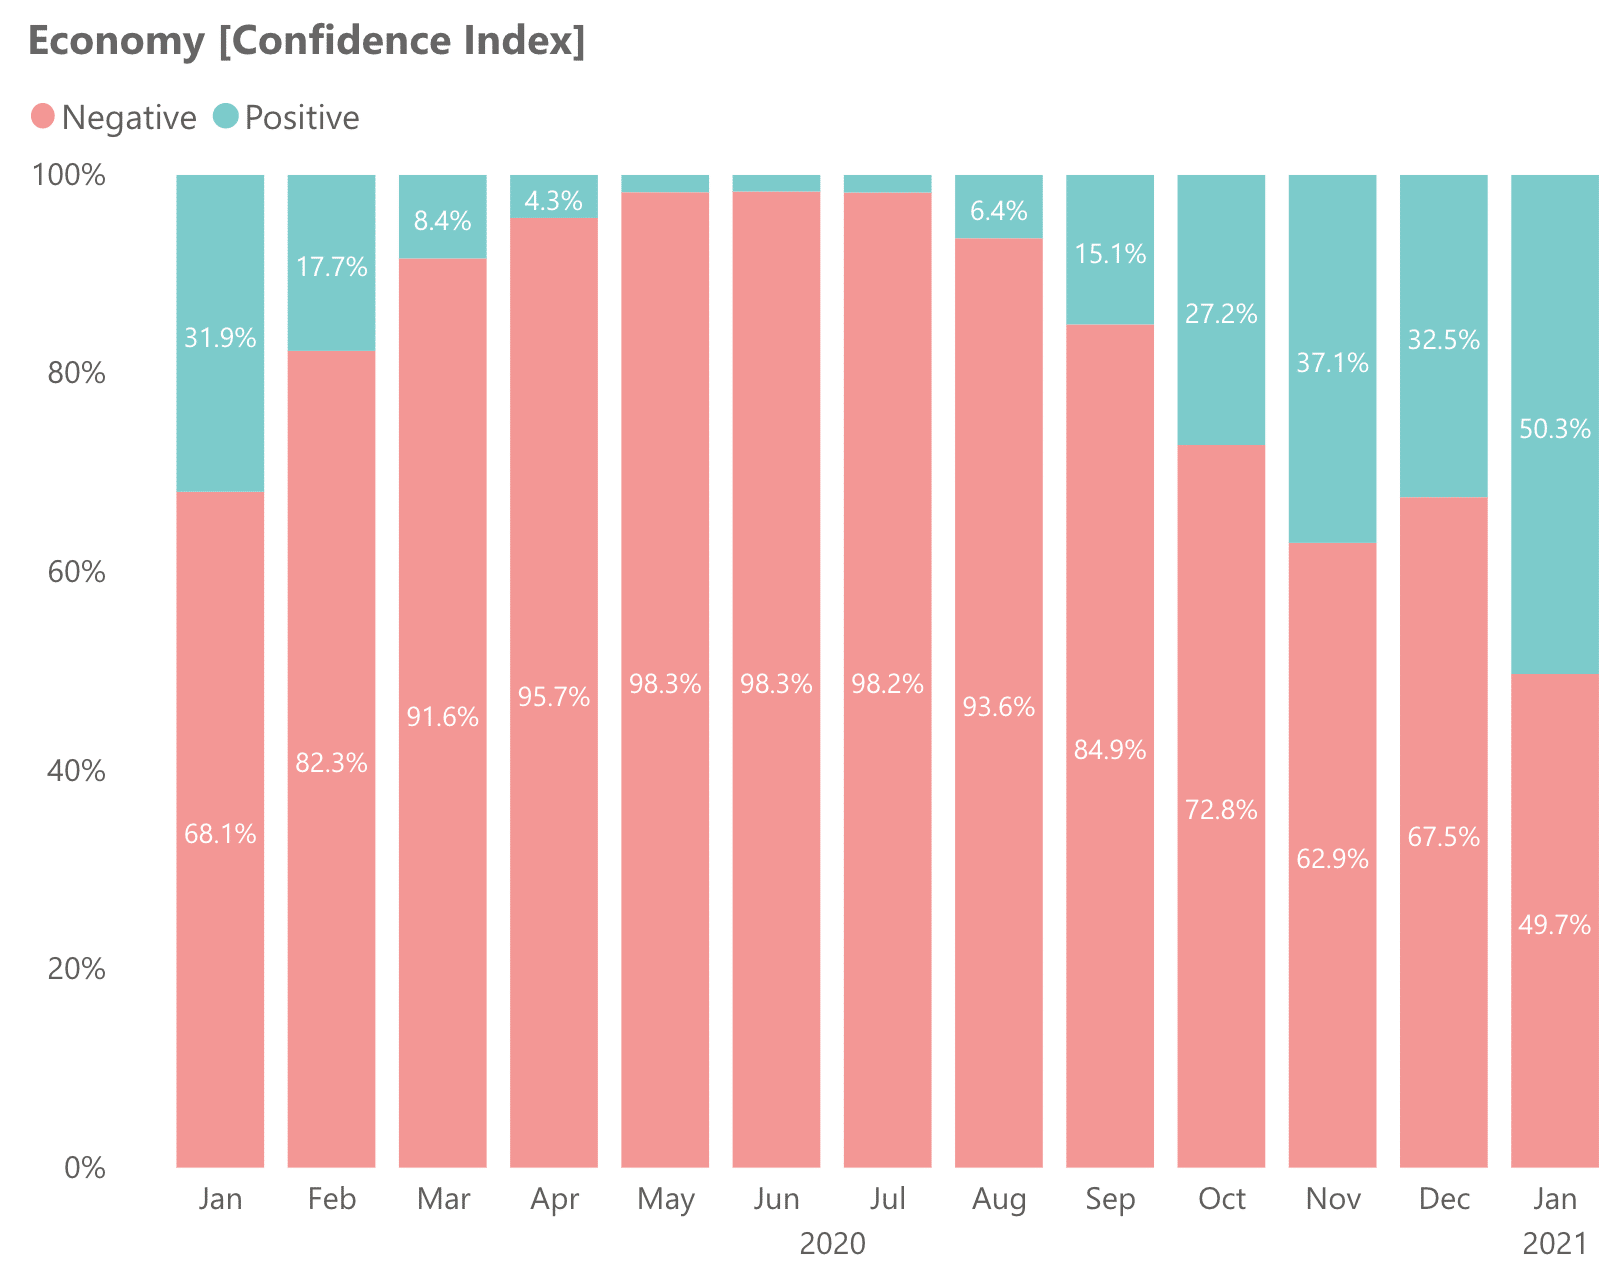 Economy confidence index in KSA